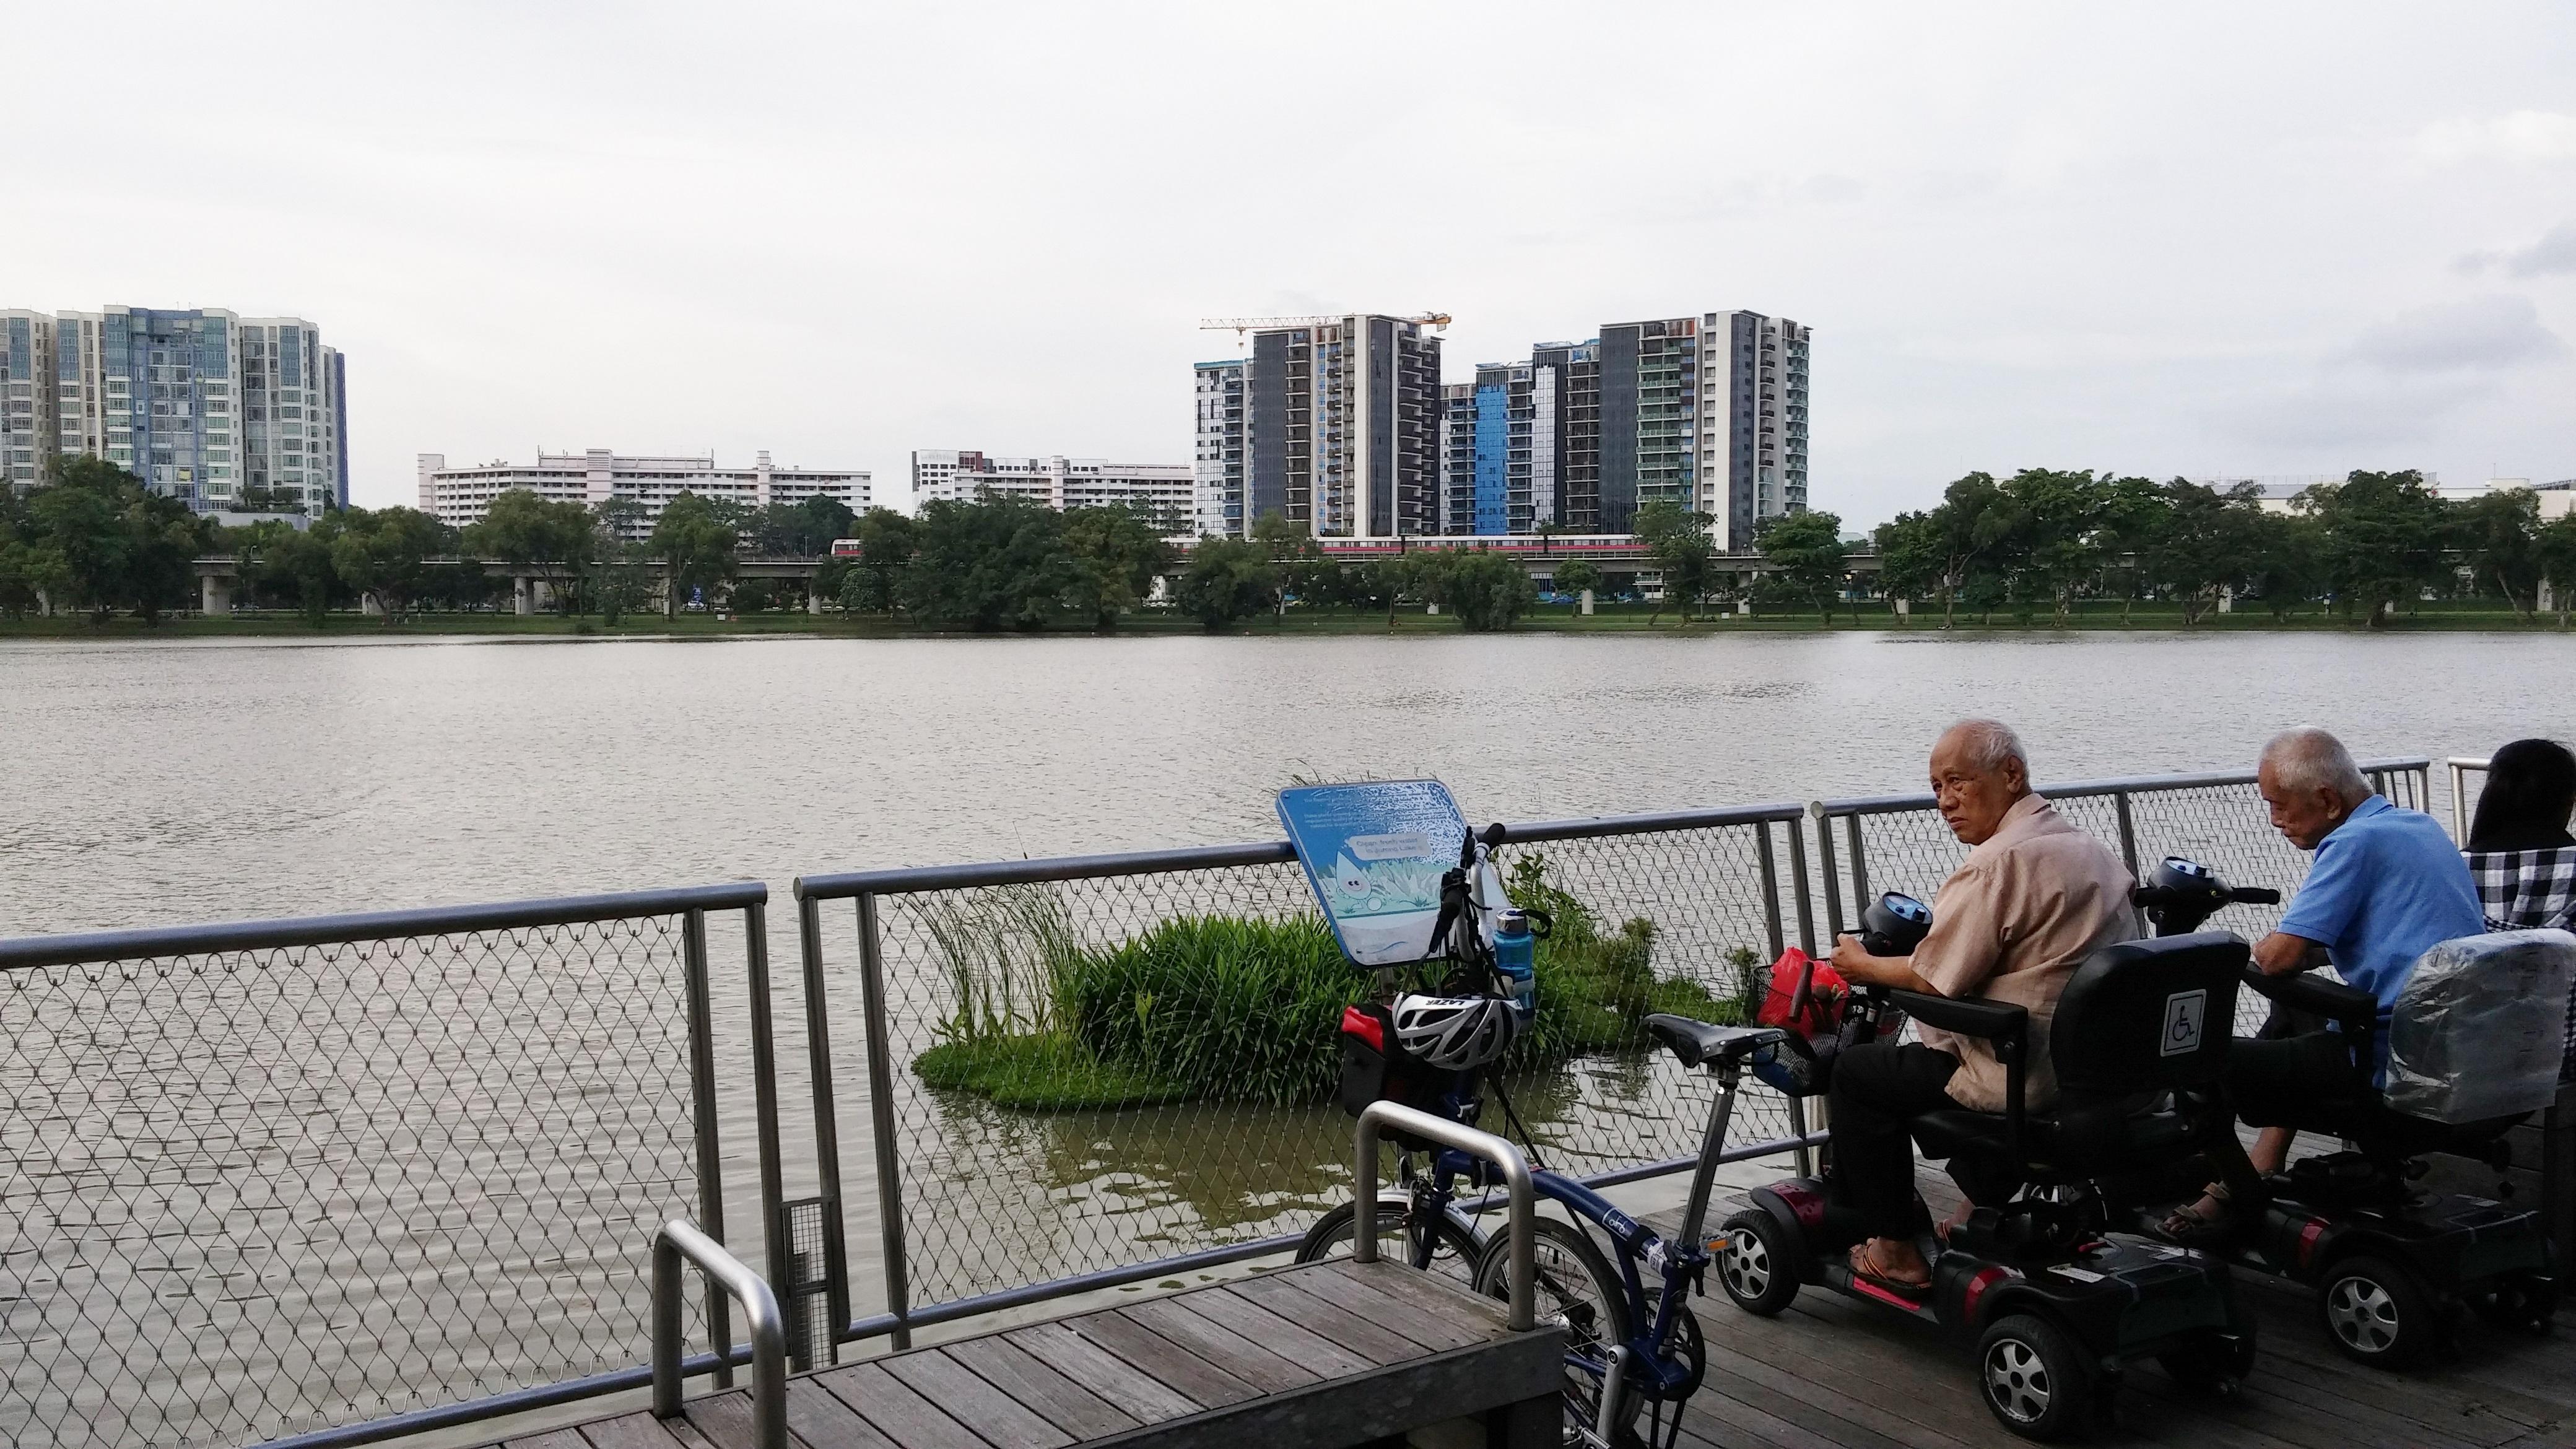 Jurong Lake Promenade